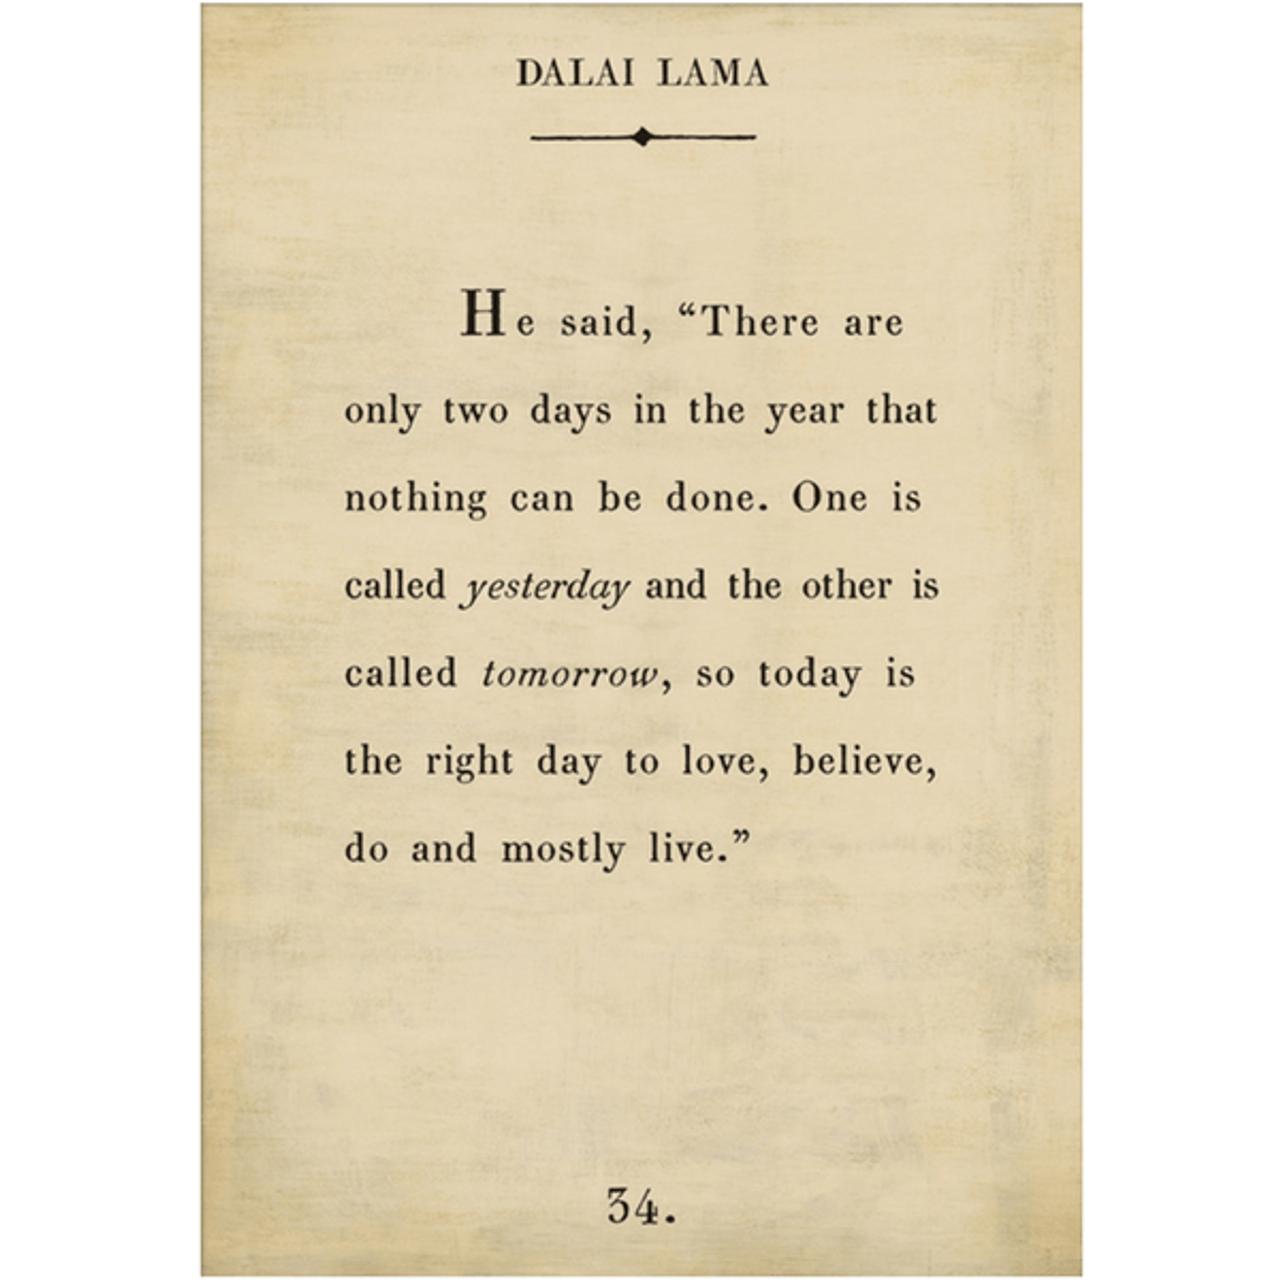 dalai lama art print - cream with gallery wrap frame